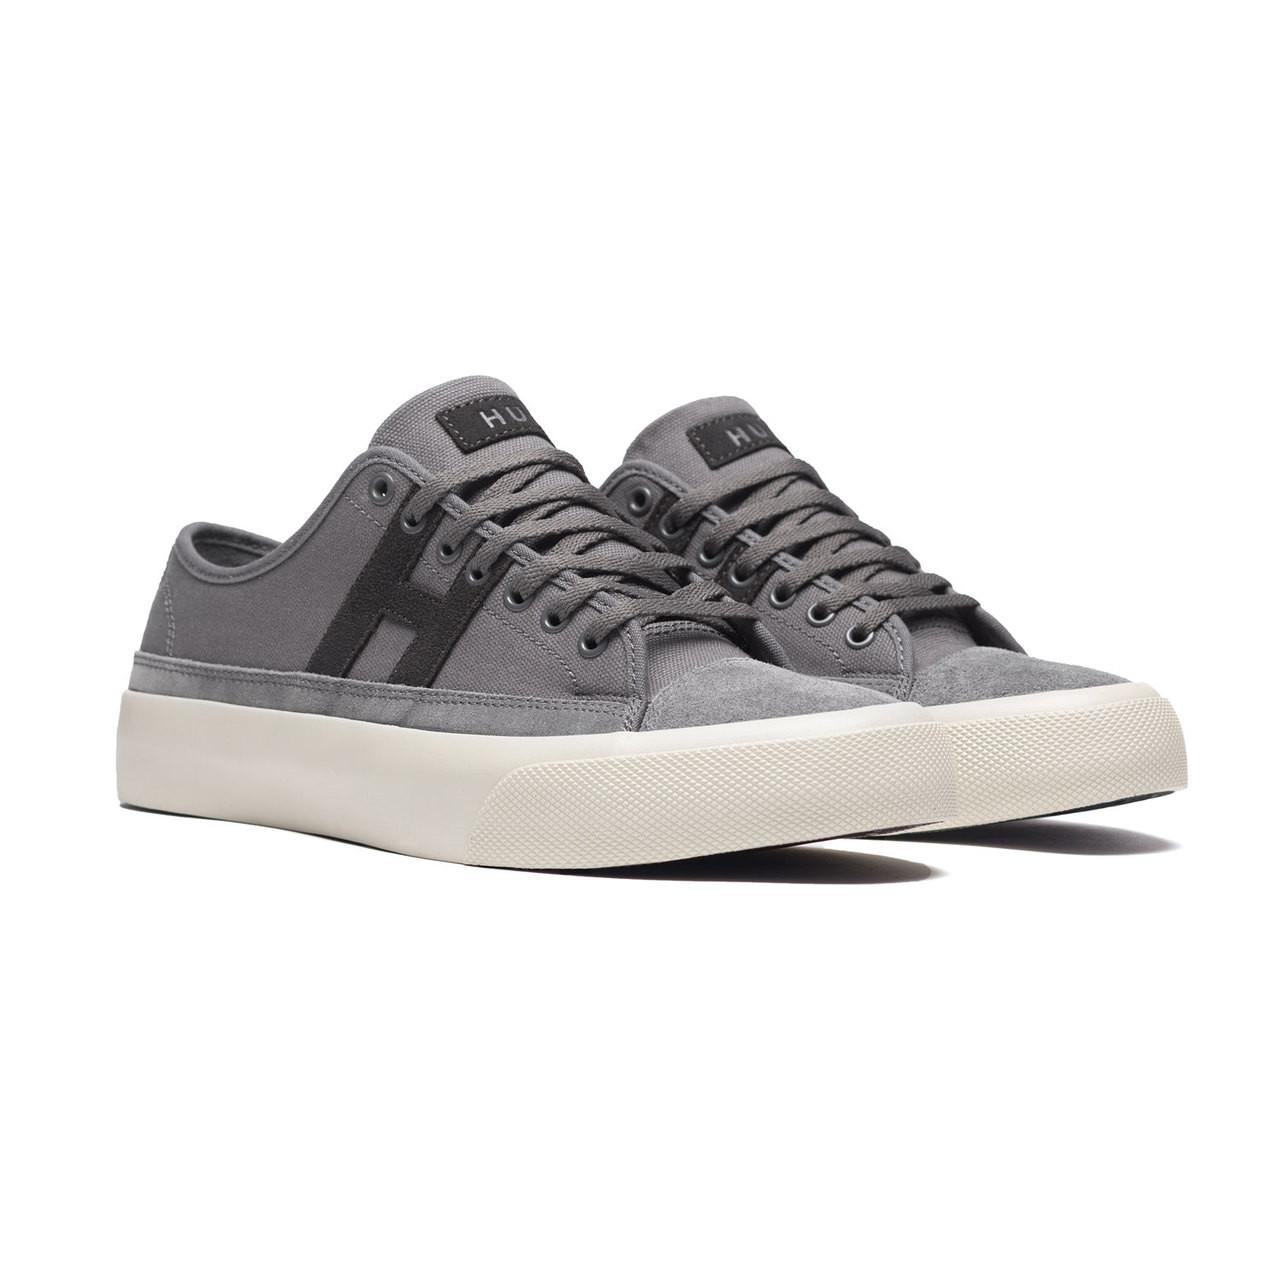 7f667cbd1b8 ... Huf Shoes Hupper 2 Lo Grey. Image 1. Click to enlarge